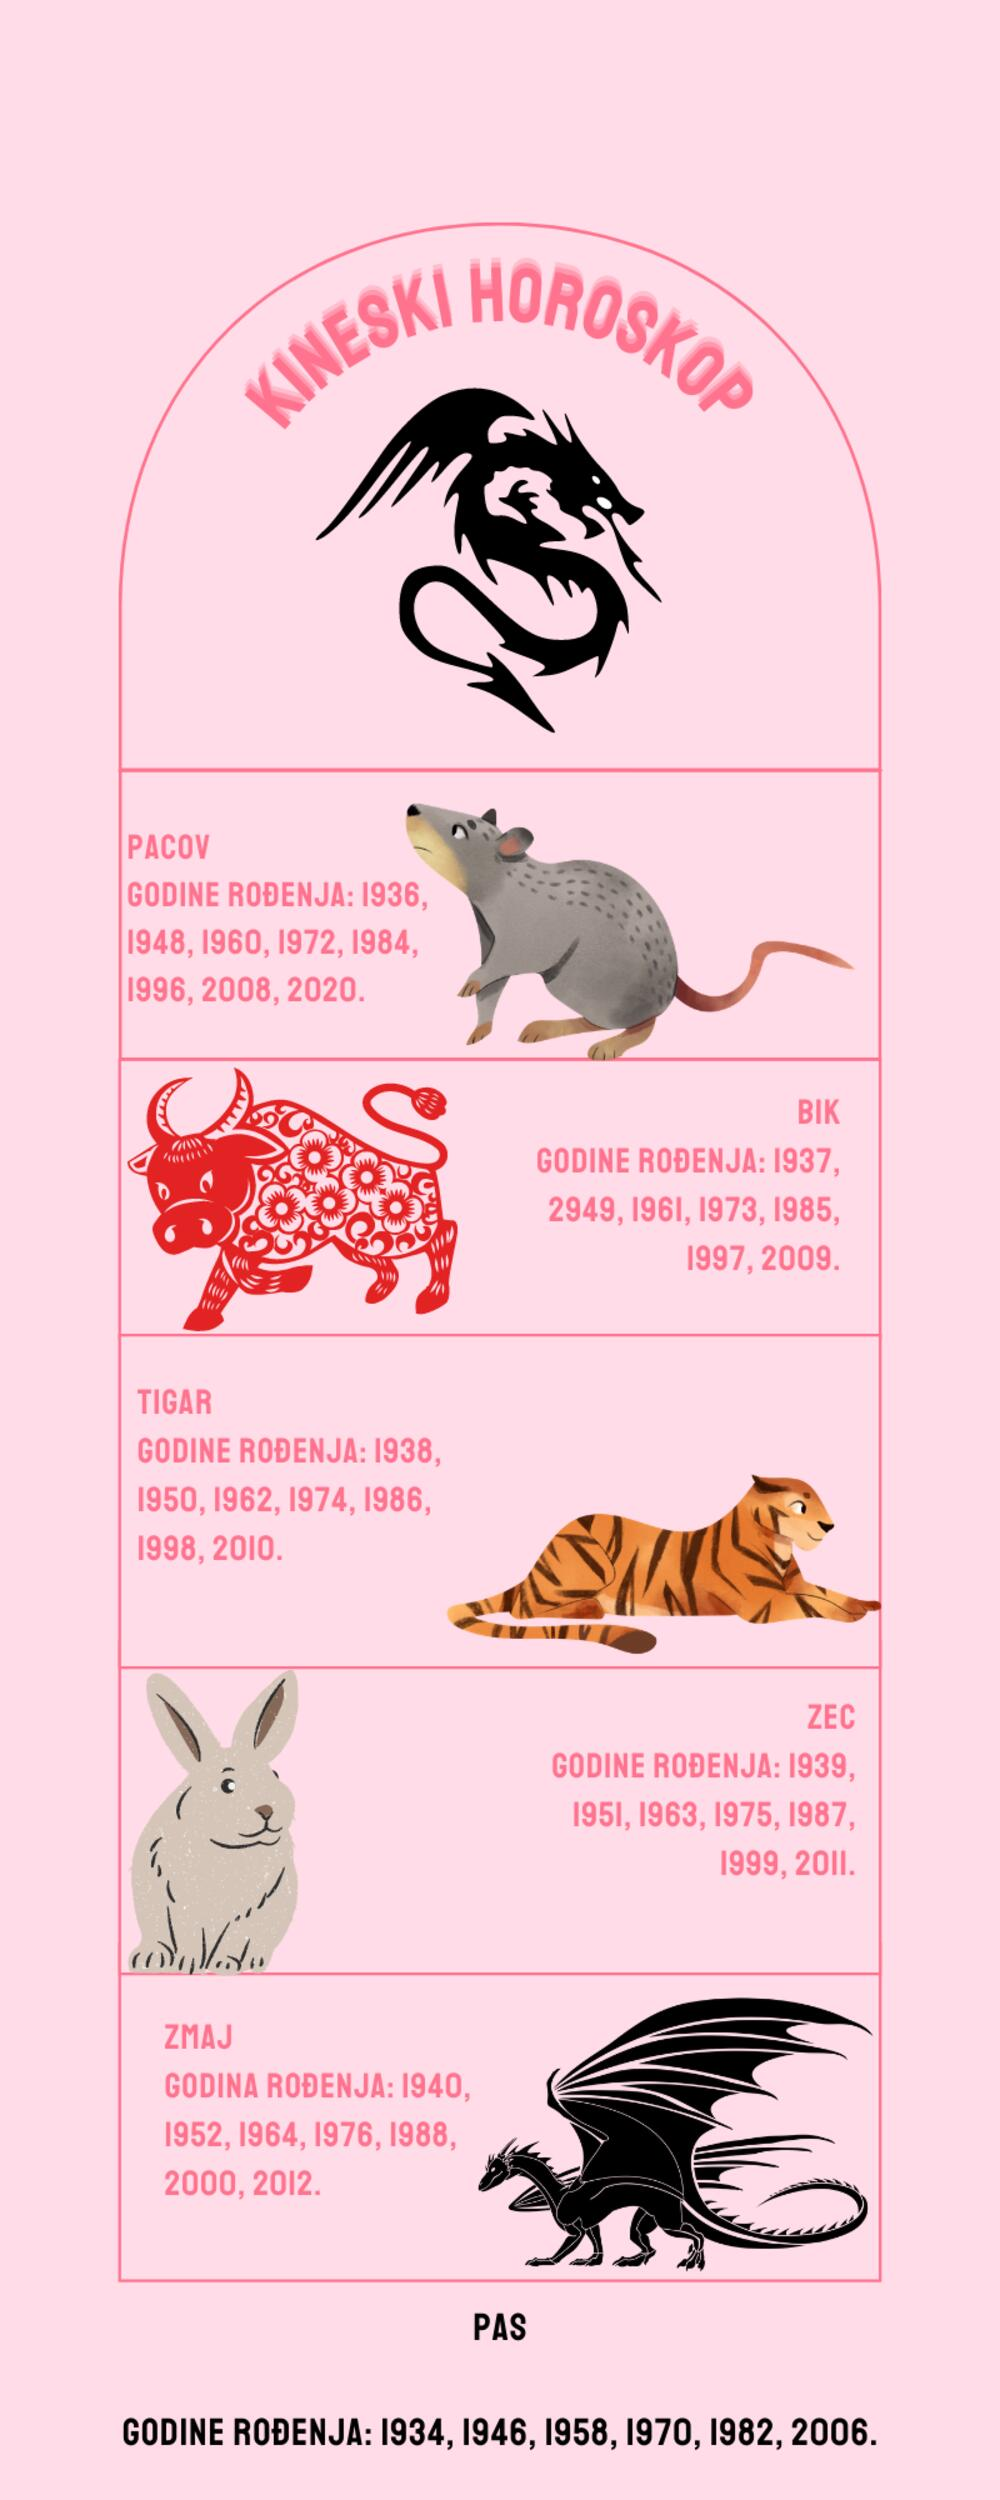 kineski horoskop, znaci u kineskom horoskopu